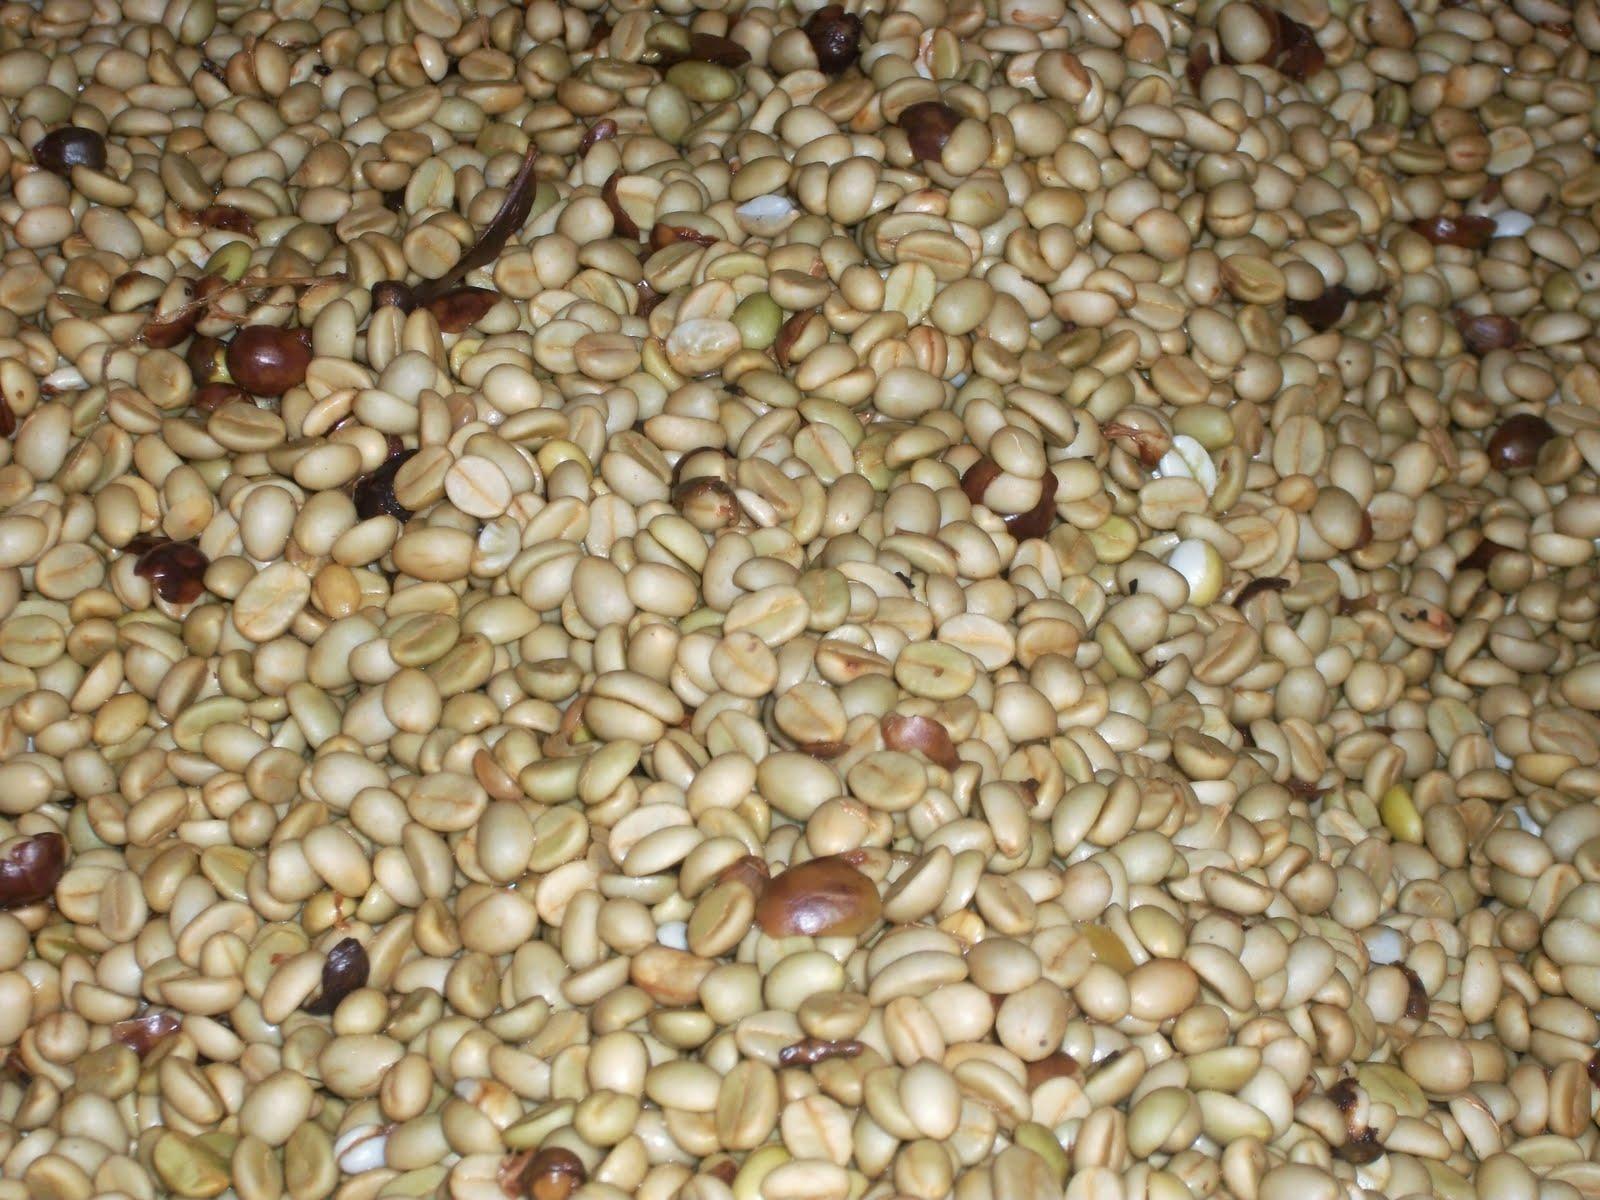 Fermenting Coffee Beans ~ Mi vida humilde may